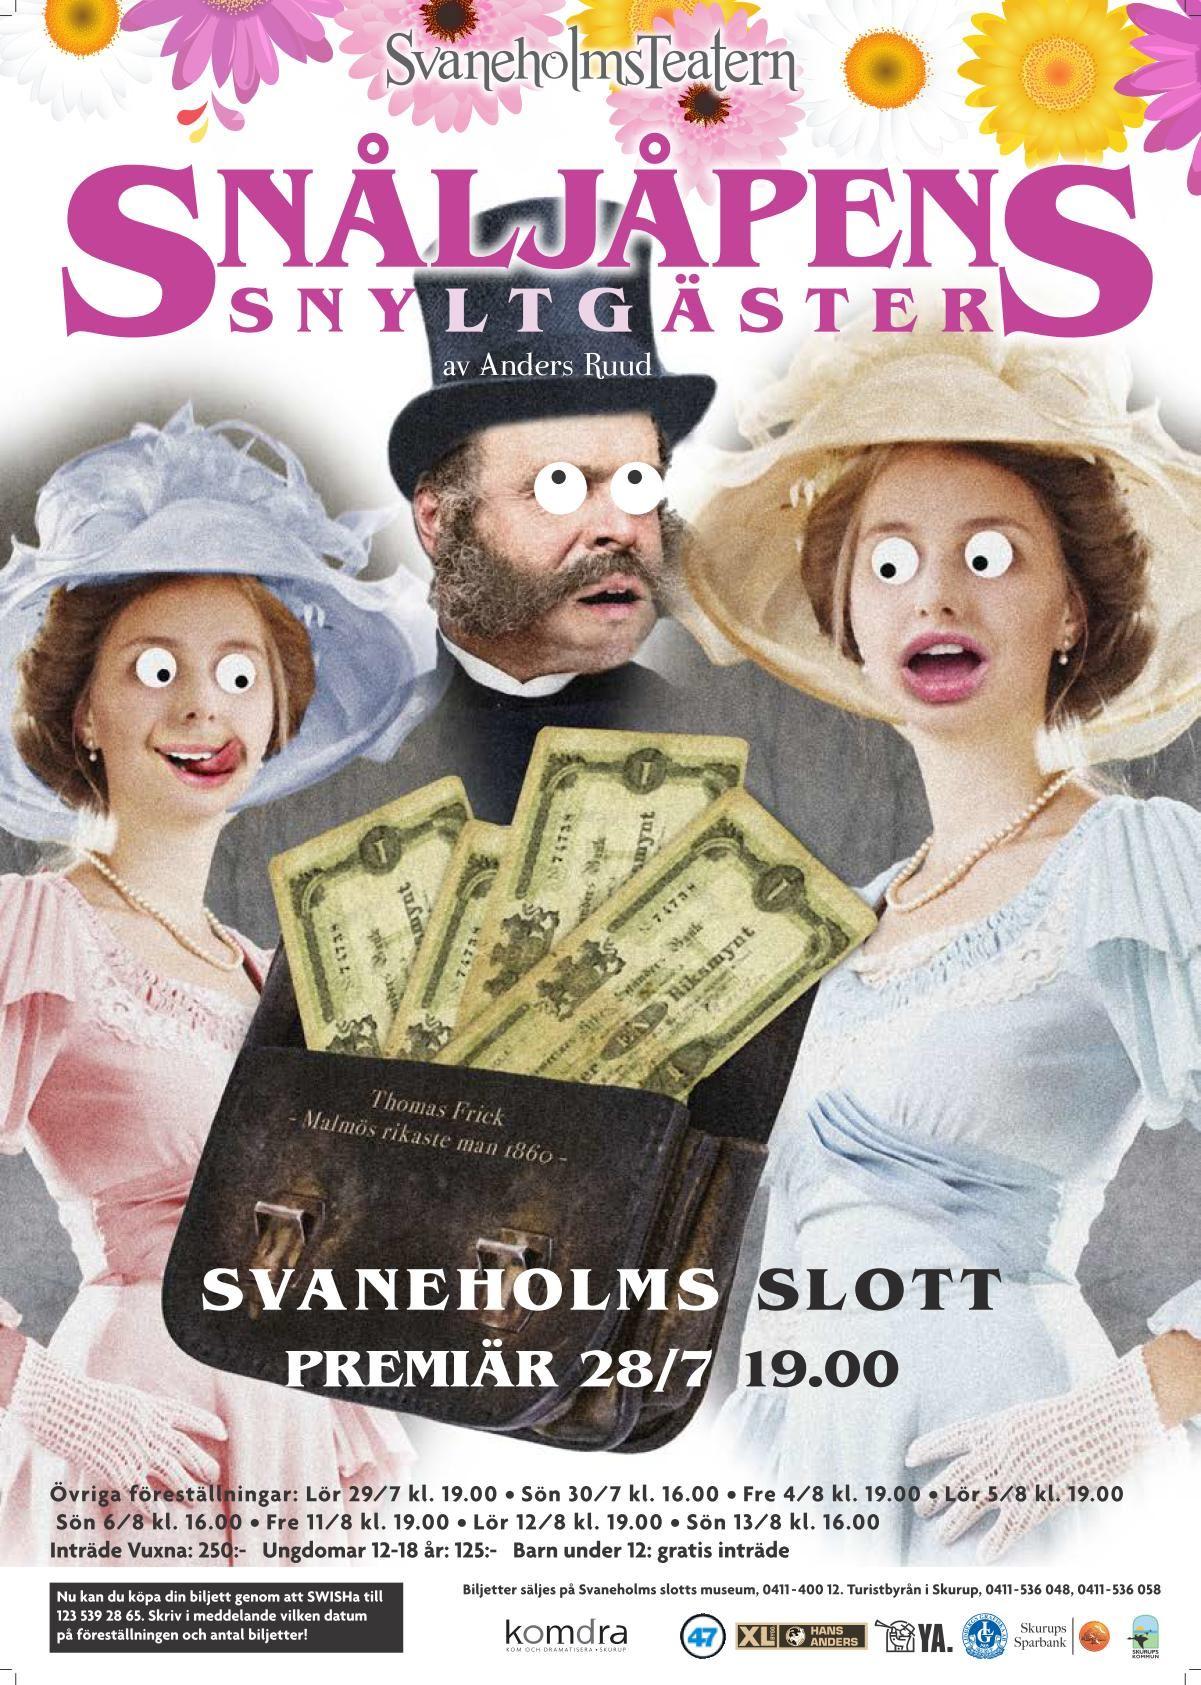 Svaneholmsteatern ger Snåljåpens snyltgäster